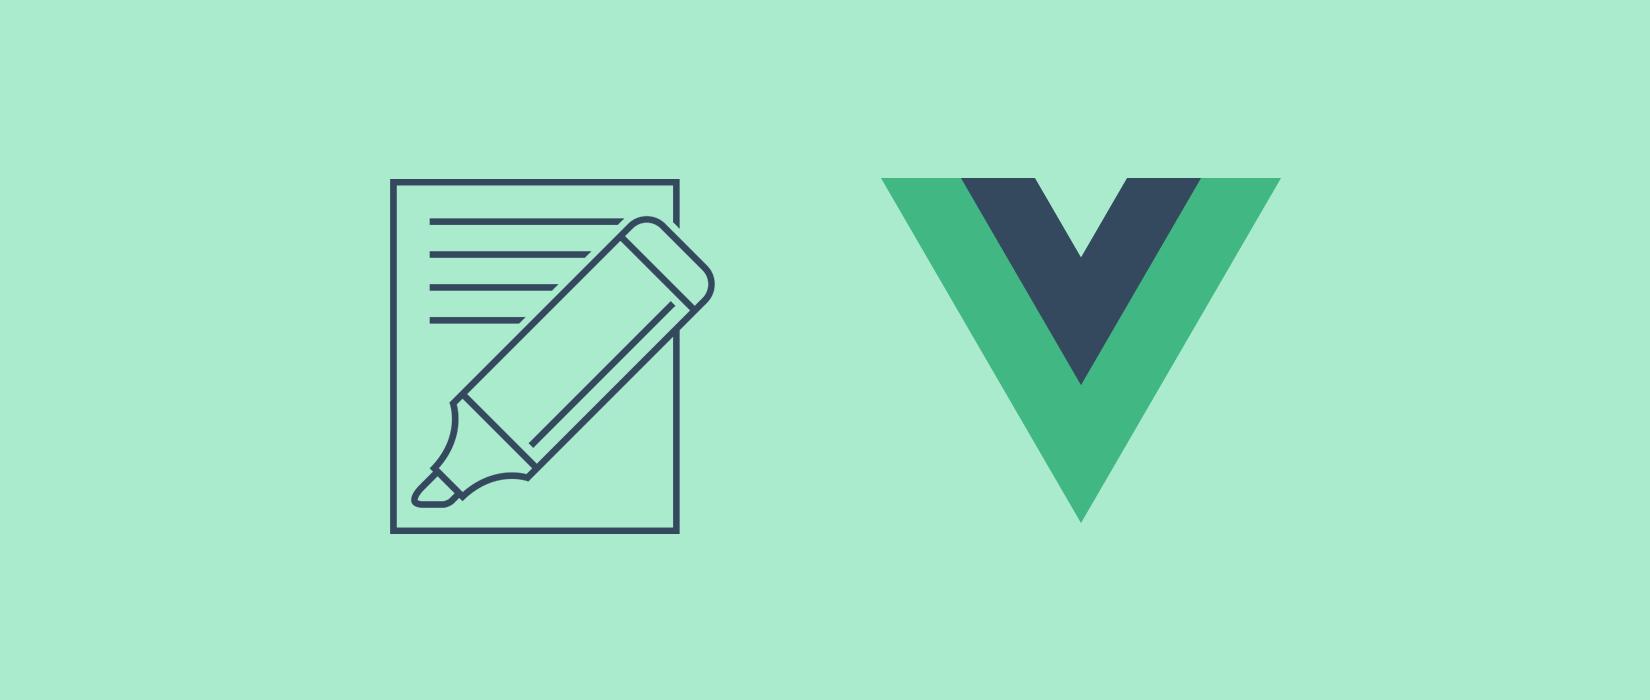 Vue Prerender Plugin Tutorial - Vue 2 SEO without Server